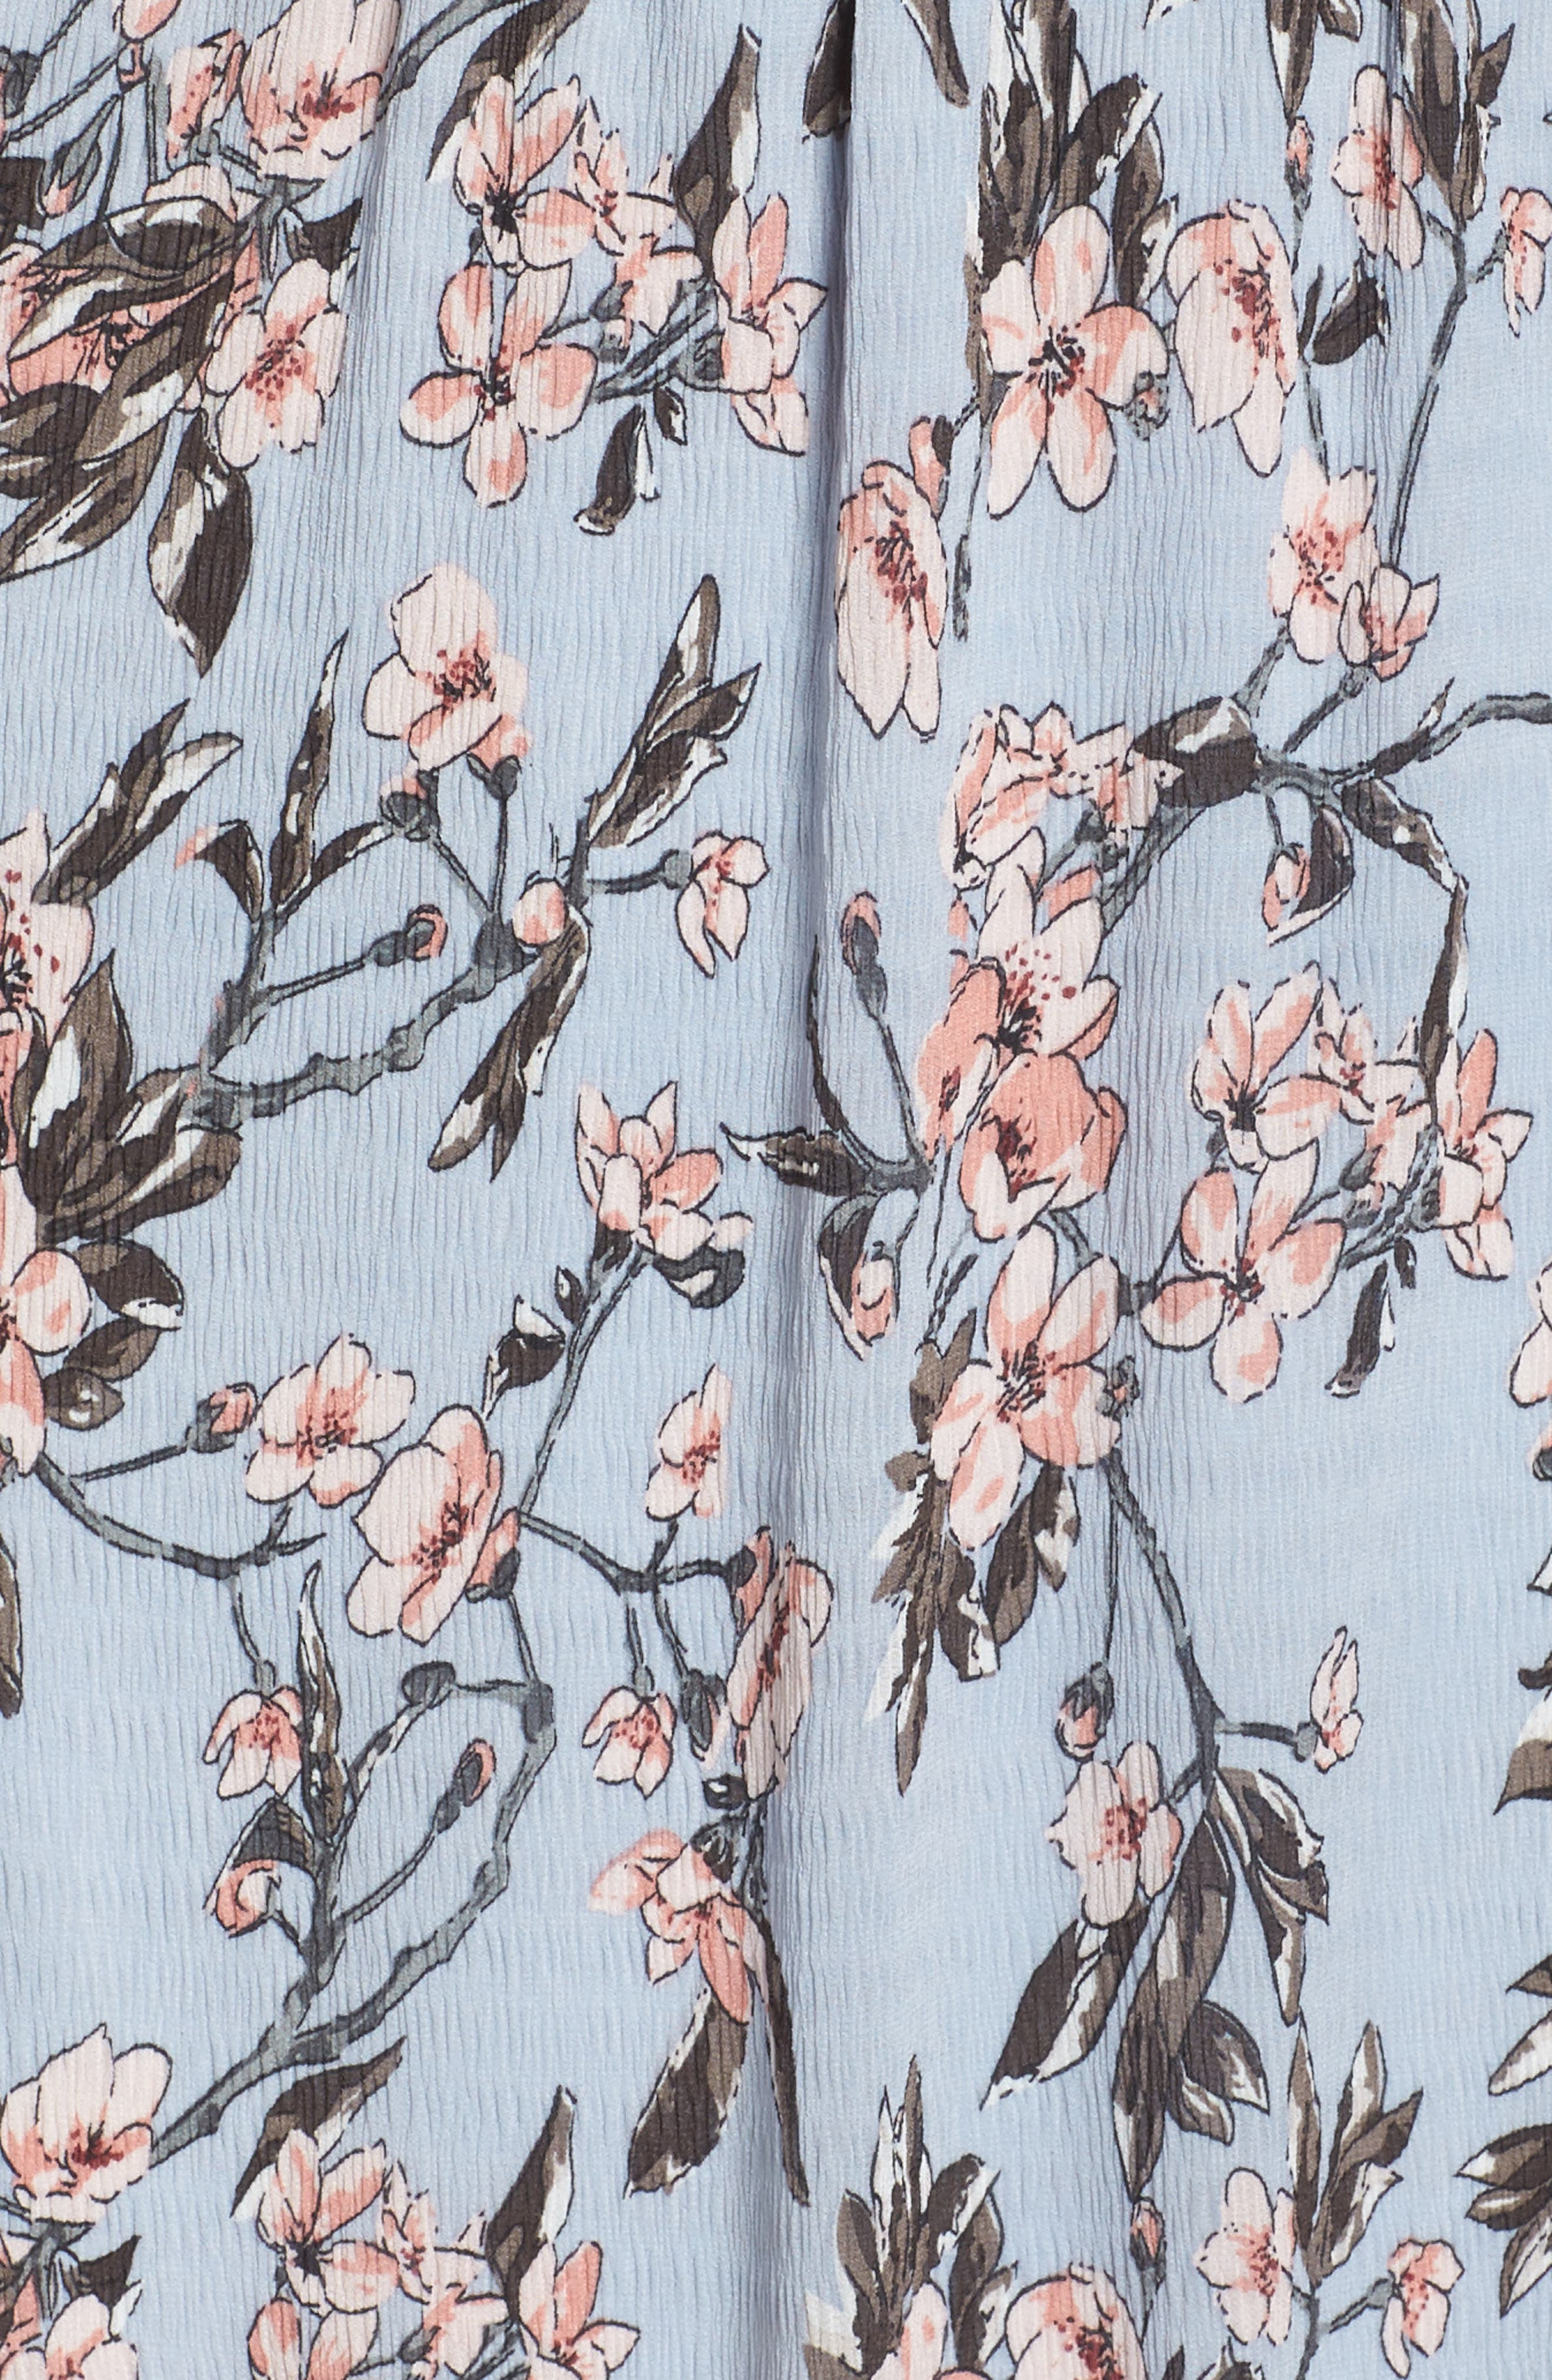 Off the Shoulder Midi Dress,                             Alternate thumbnail 6, color,                             Light Blue Sakura Floral